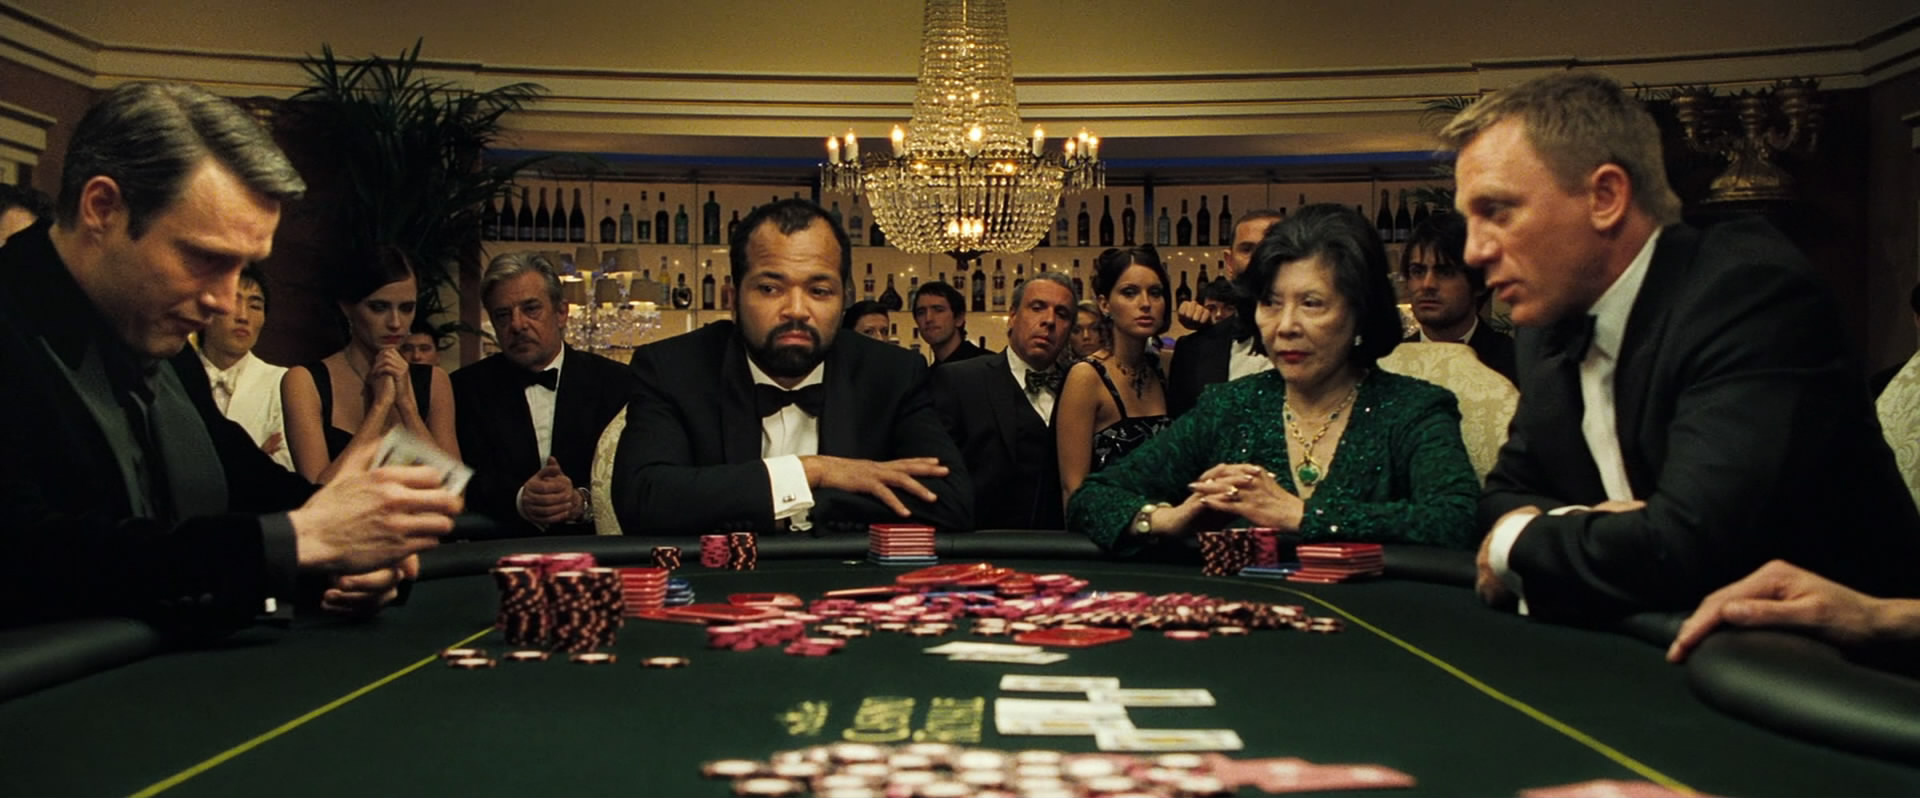 Casino royale escenas oaklawn casino